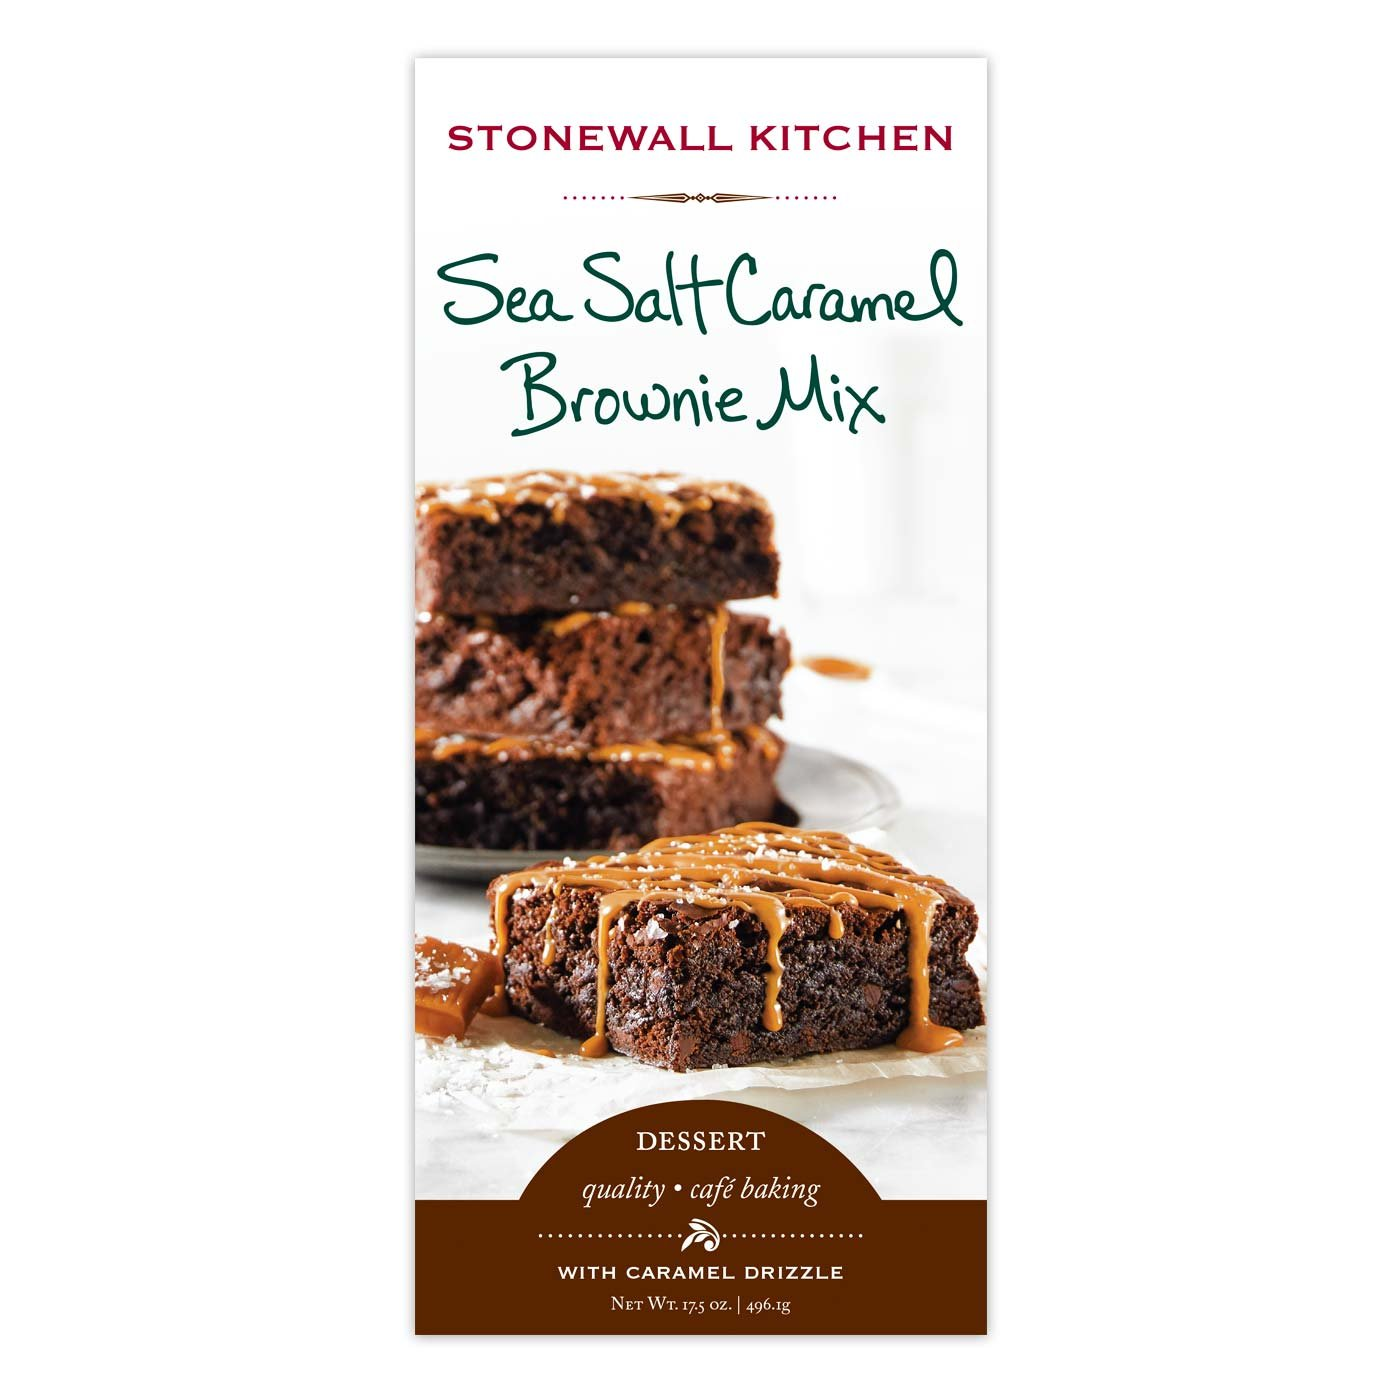 Stonewall Kitchen Sea Salt Caramel Brownie Mix